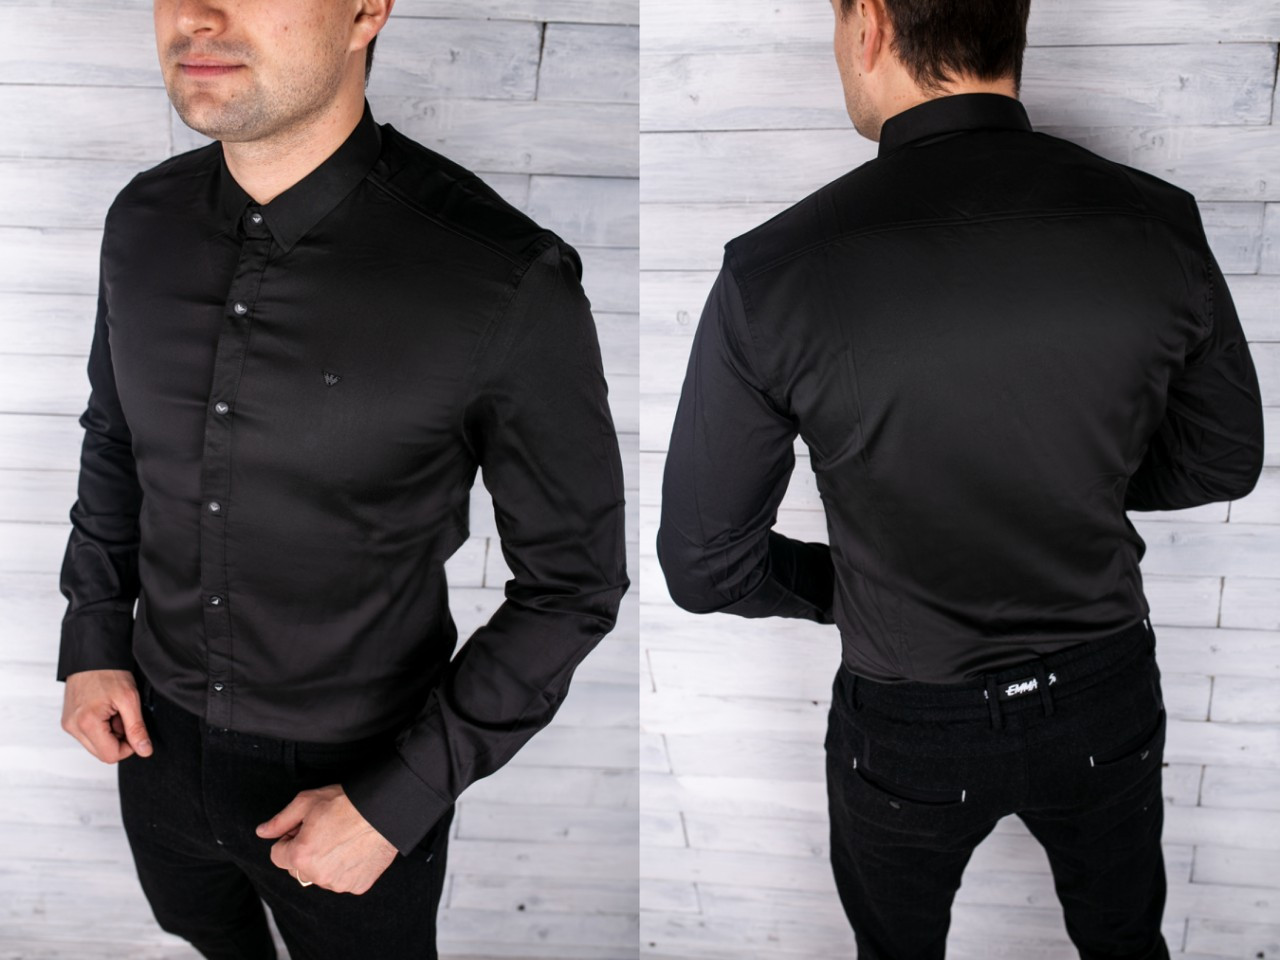 e86a0b6ddd1 Мужская рубашка Armani Материал  95% cotton